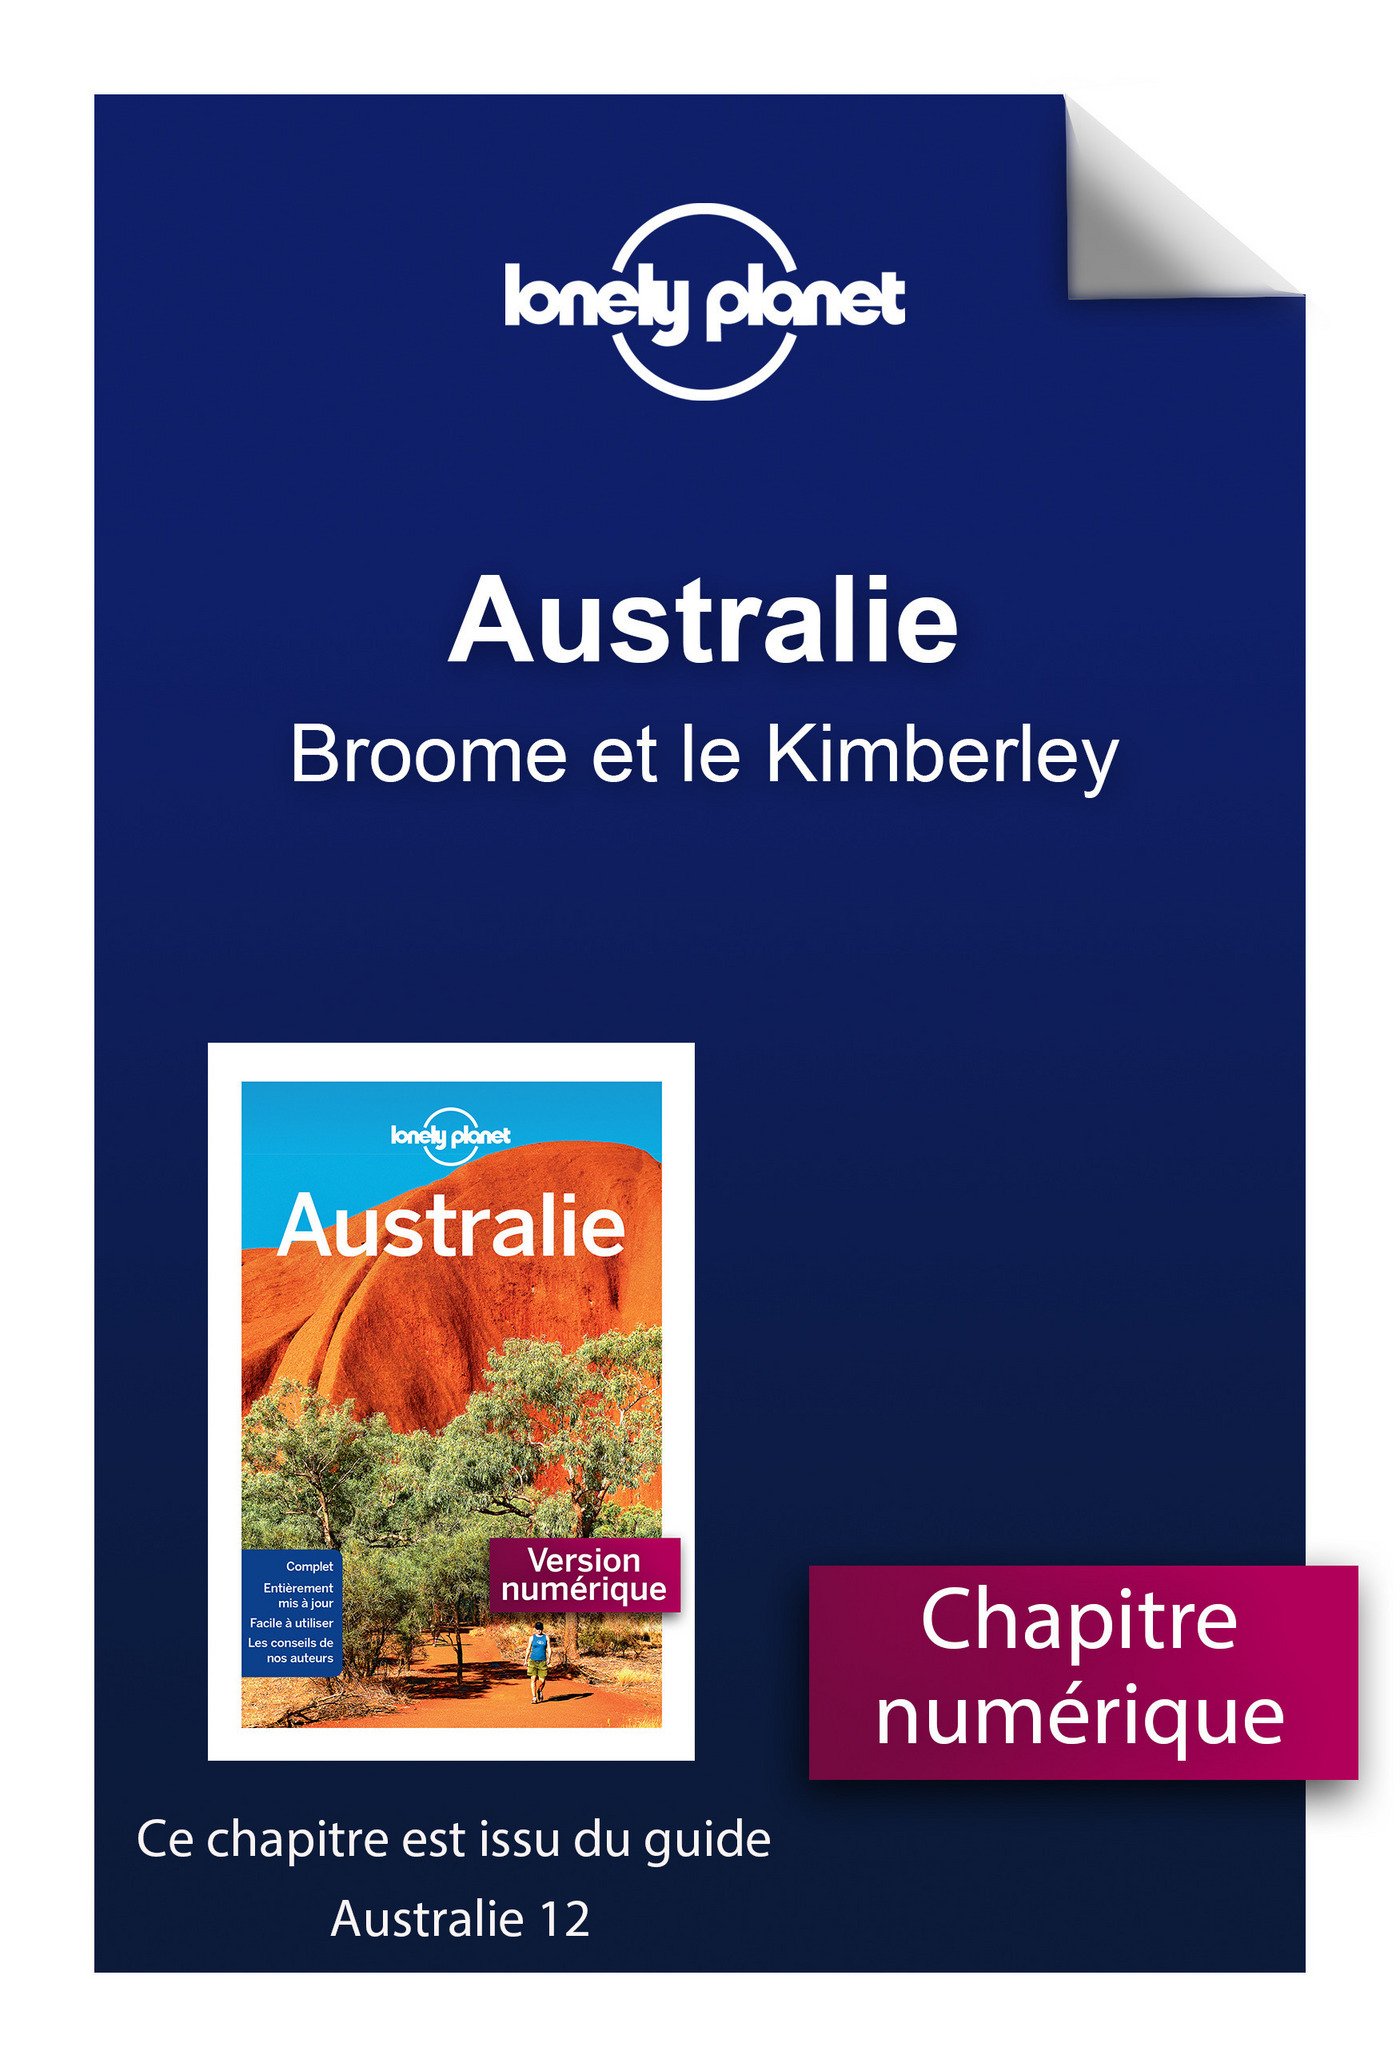 Australie - Broome et le Kimberley